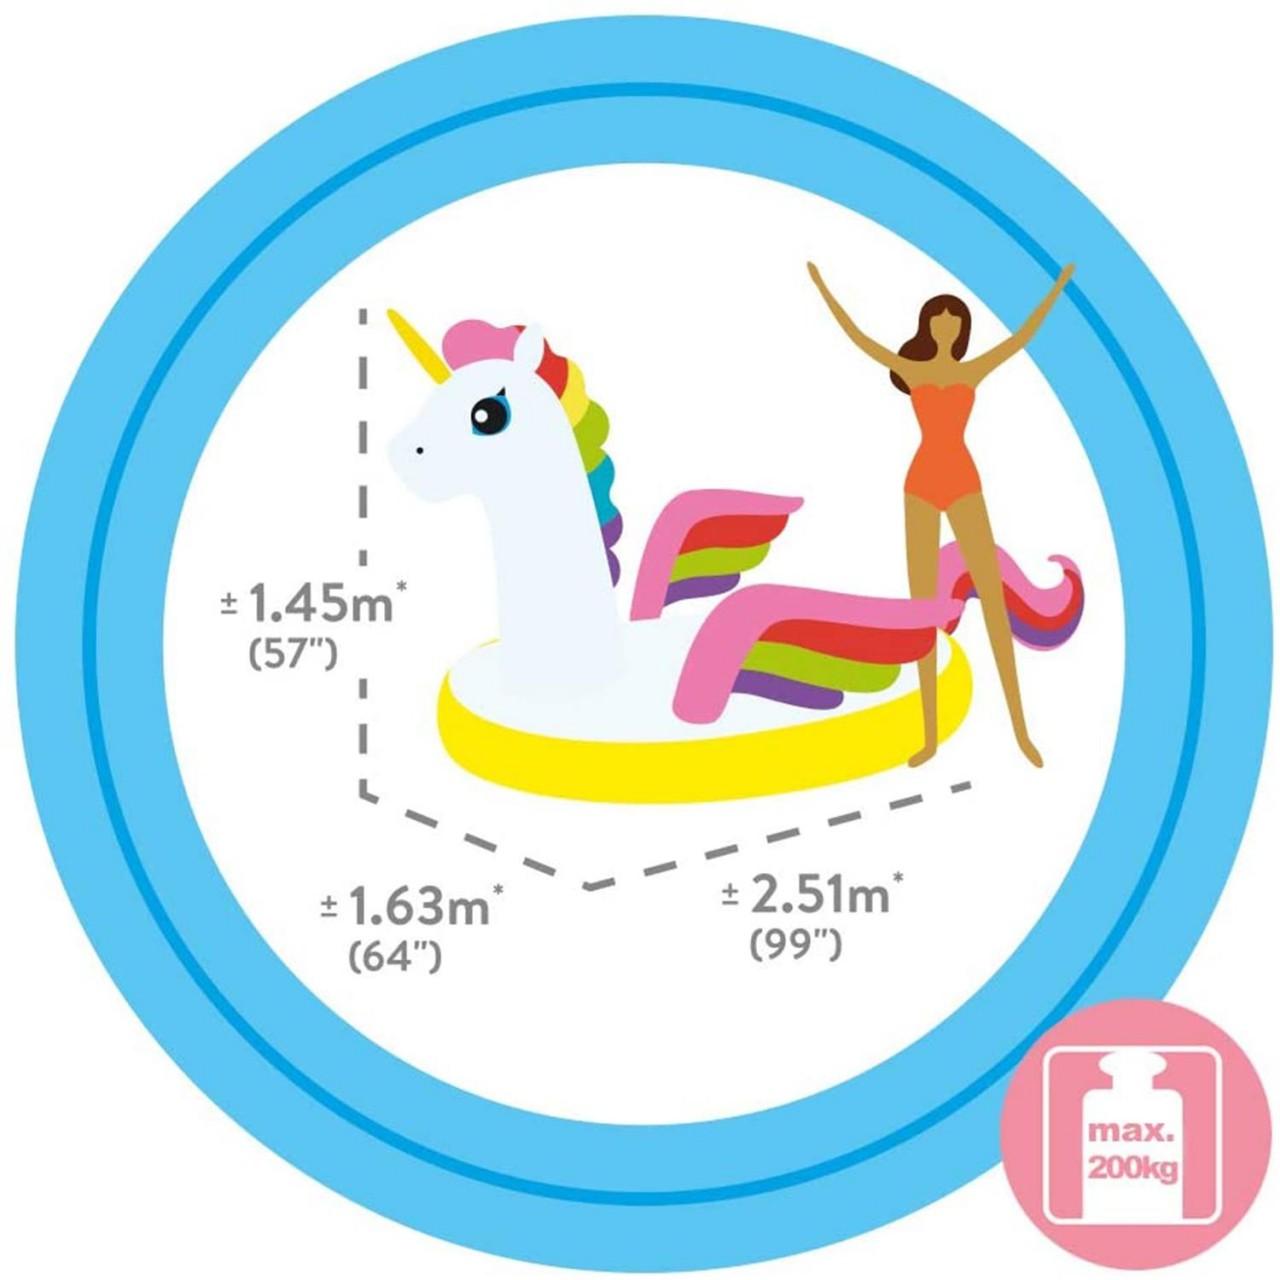 Intex Mega Unicorn Einhorn Badeinsel Lounge Luftmatratze 251x163x145 cm 57291